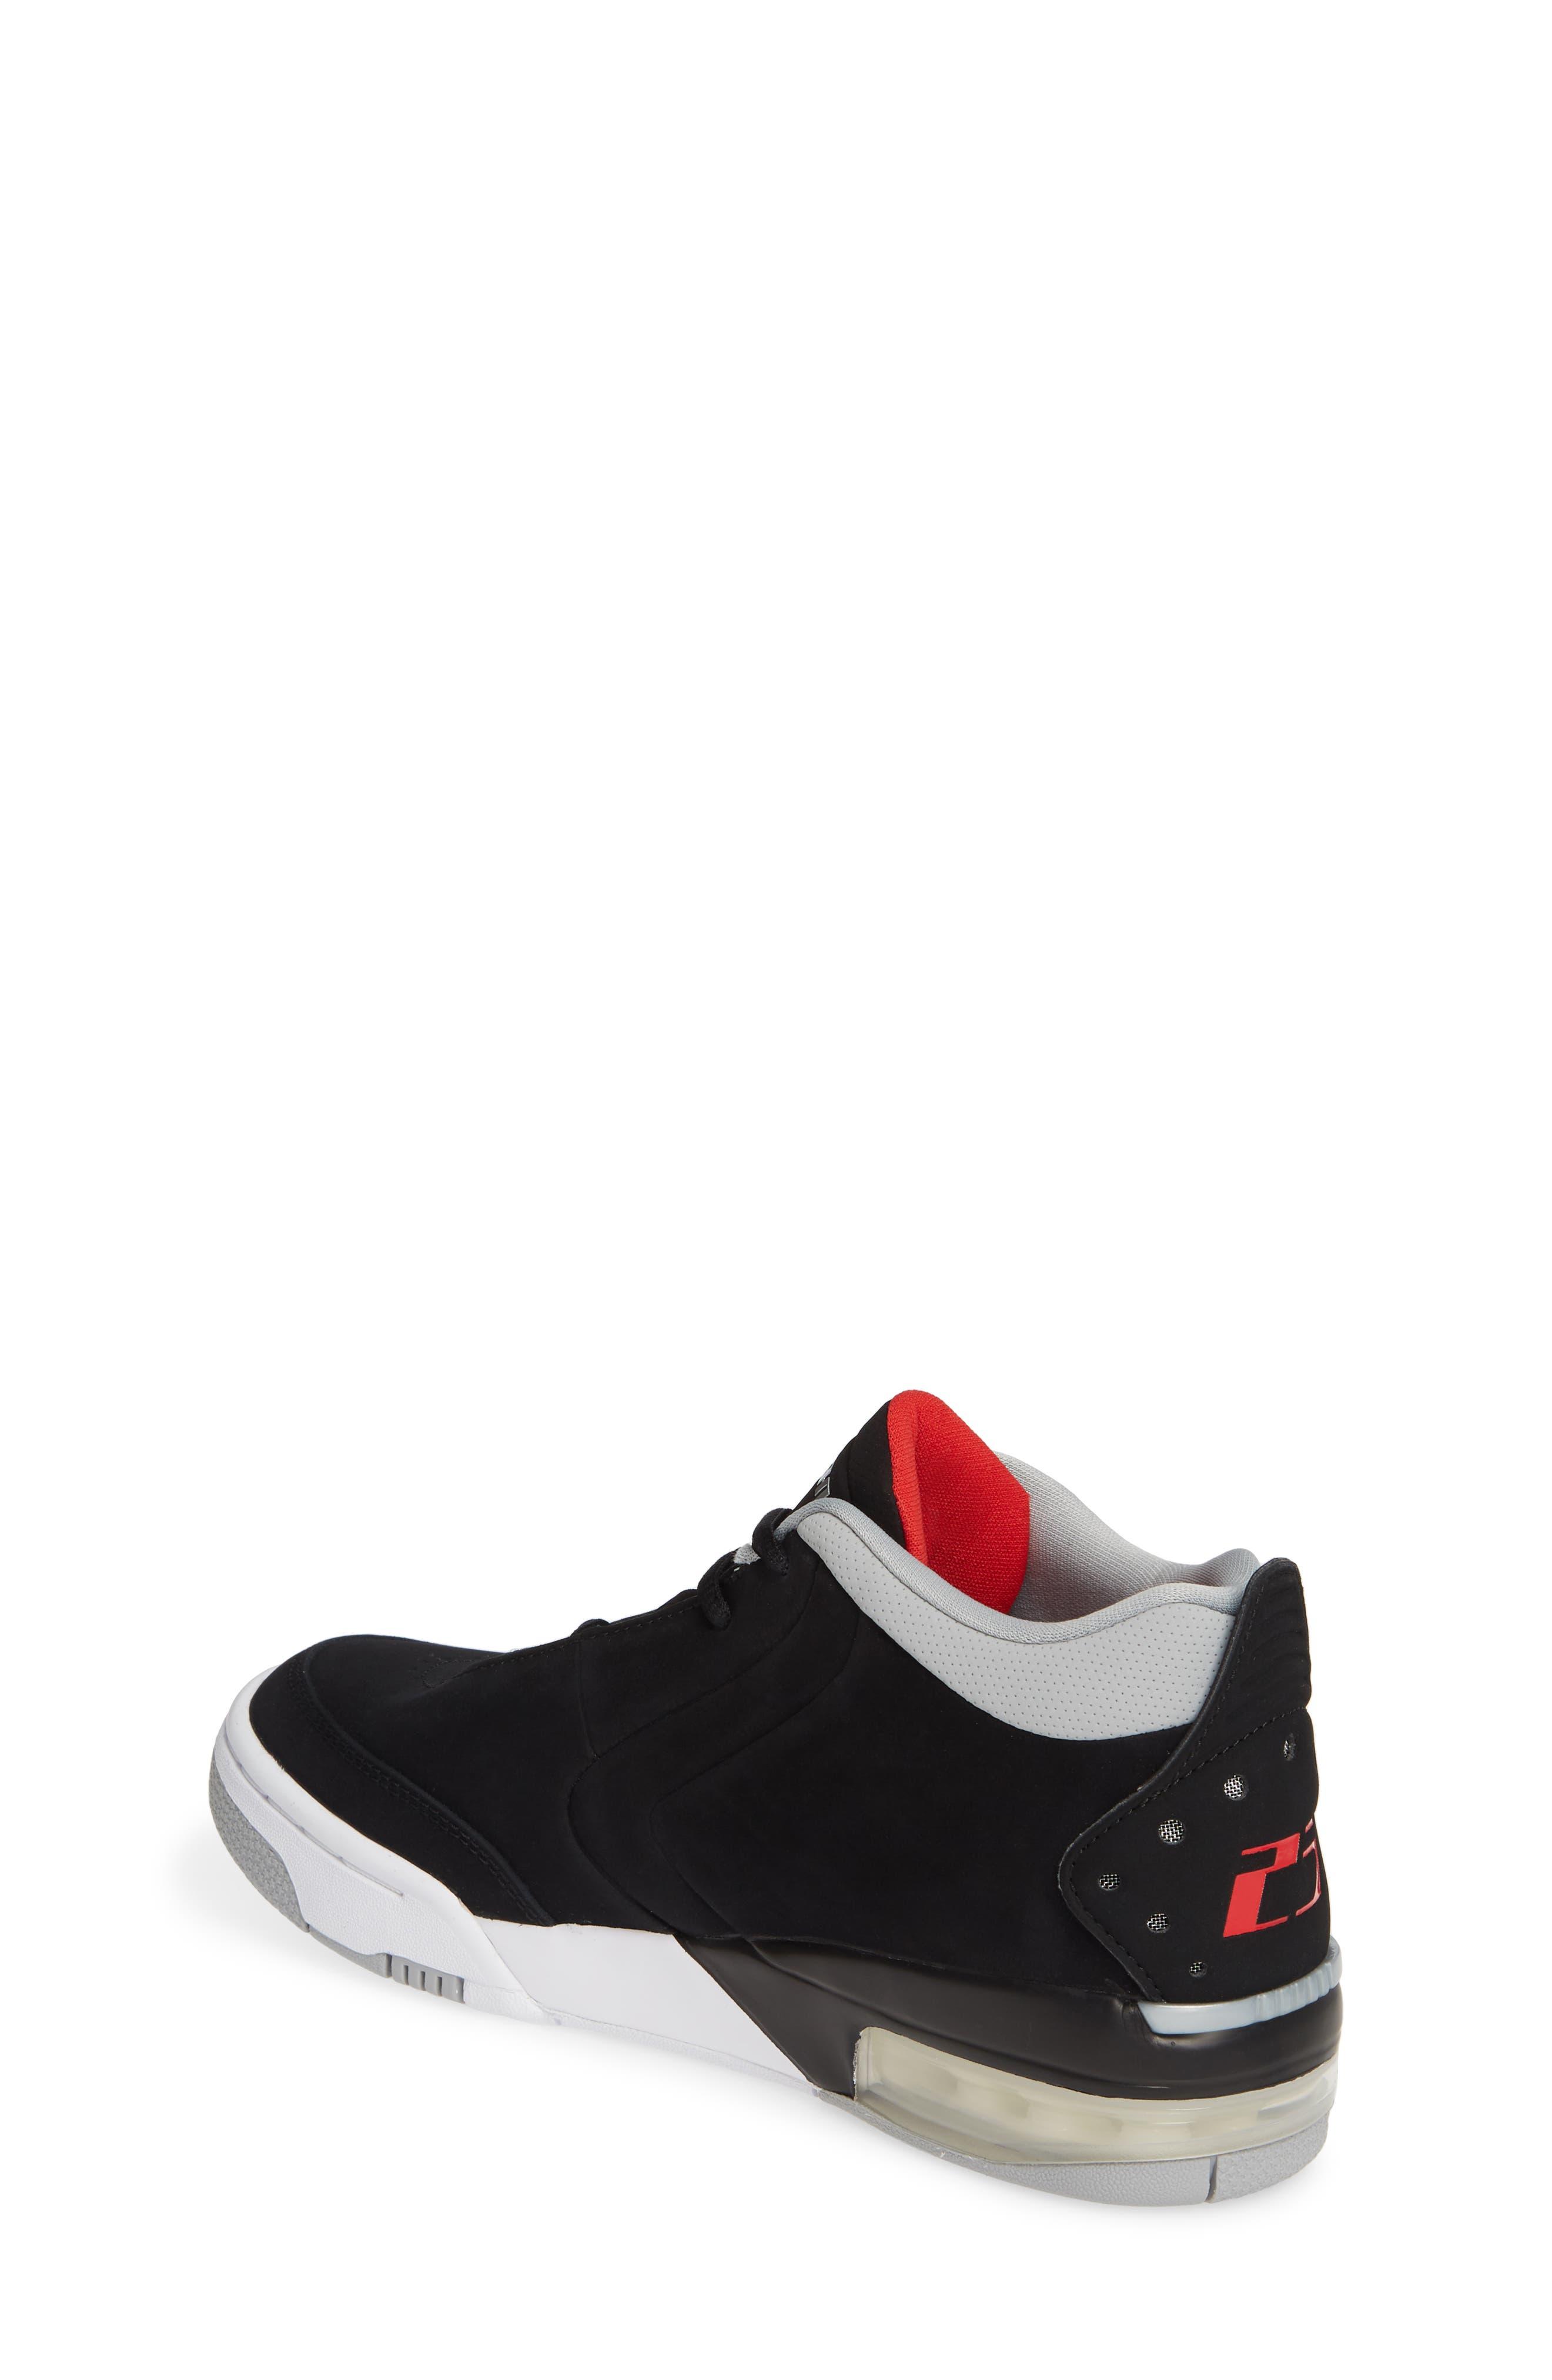 JORDAN, Big Fund Mid Top Basketball Sneaker, Alternate thumbnail 2, color, BLACK/ METALLIC SILVER-WHITE